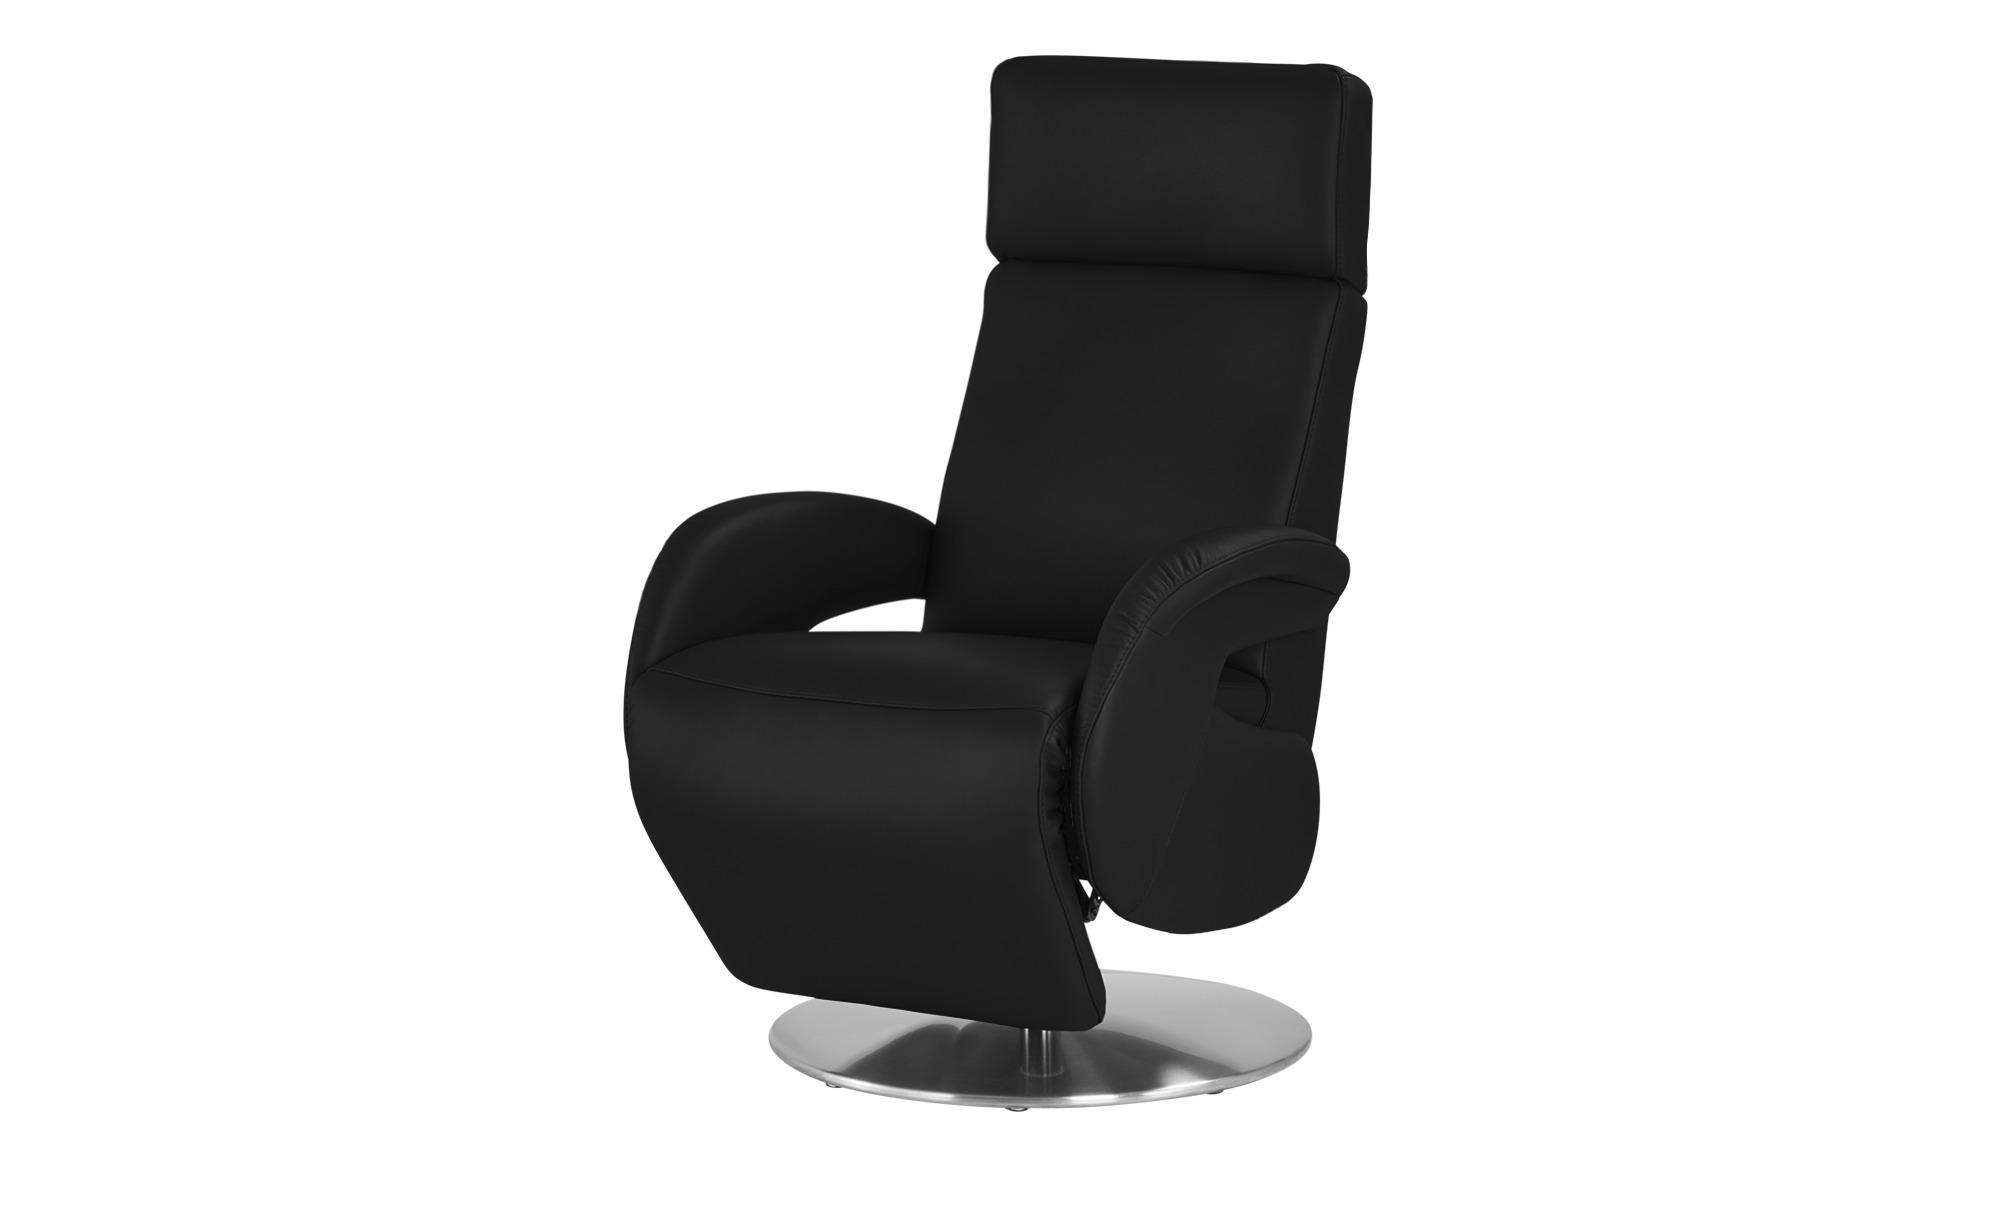 Sessel Bezug Ohrensessel Sessel Leder Cognac Moderne Relax Sessel Fernsehsessel Elektrisch Verstellbar Stof Relaxsessel Fernsehsessel Leder Sessel Design